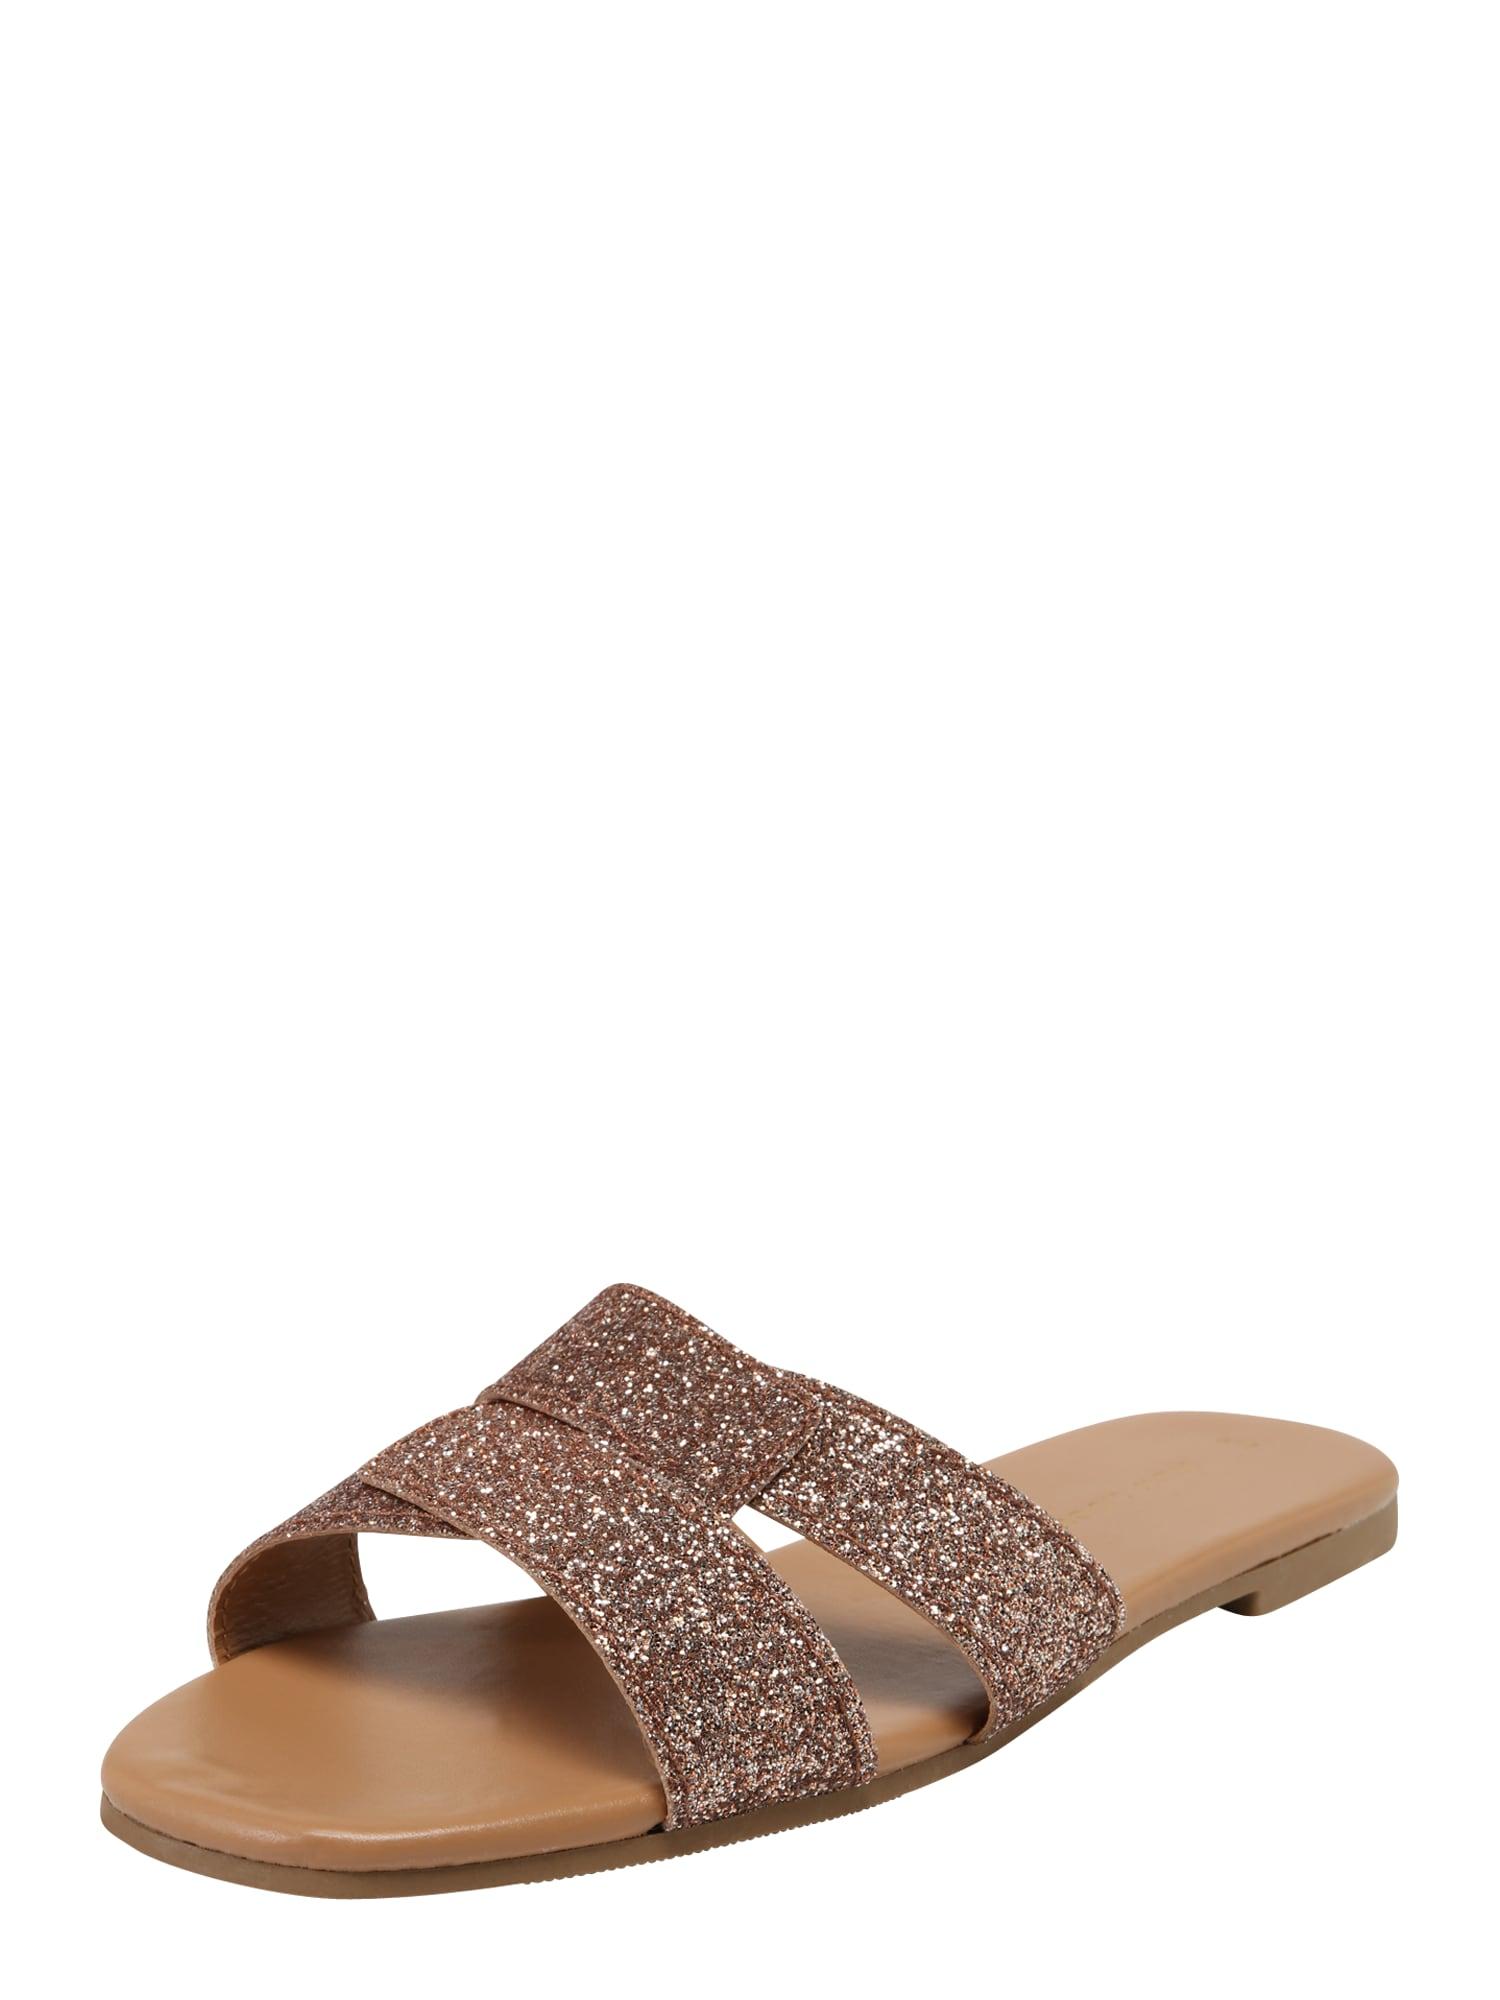 Pantofle INTERWEAVE zlatá růžová NEW LOOK